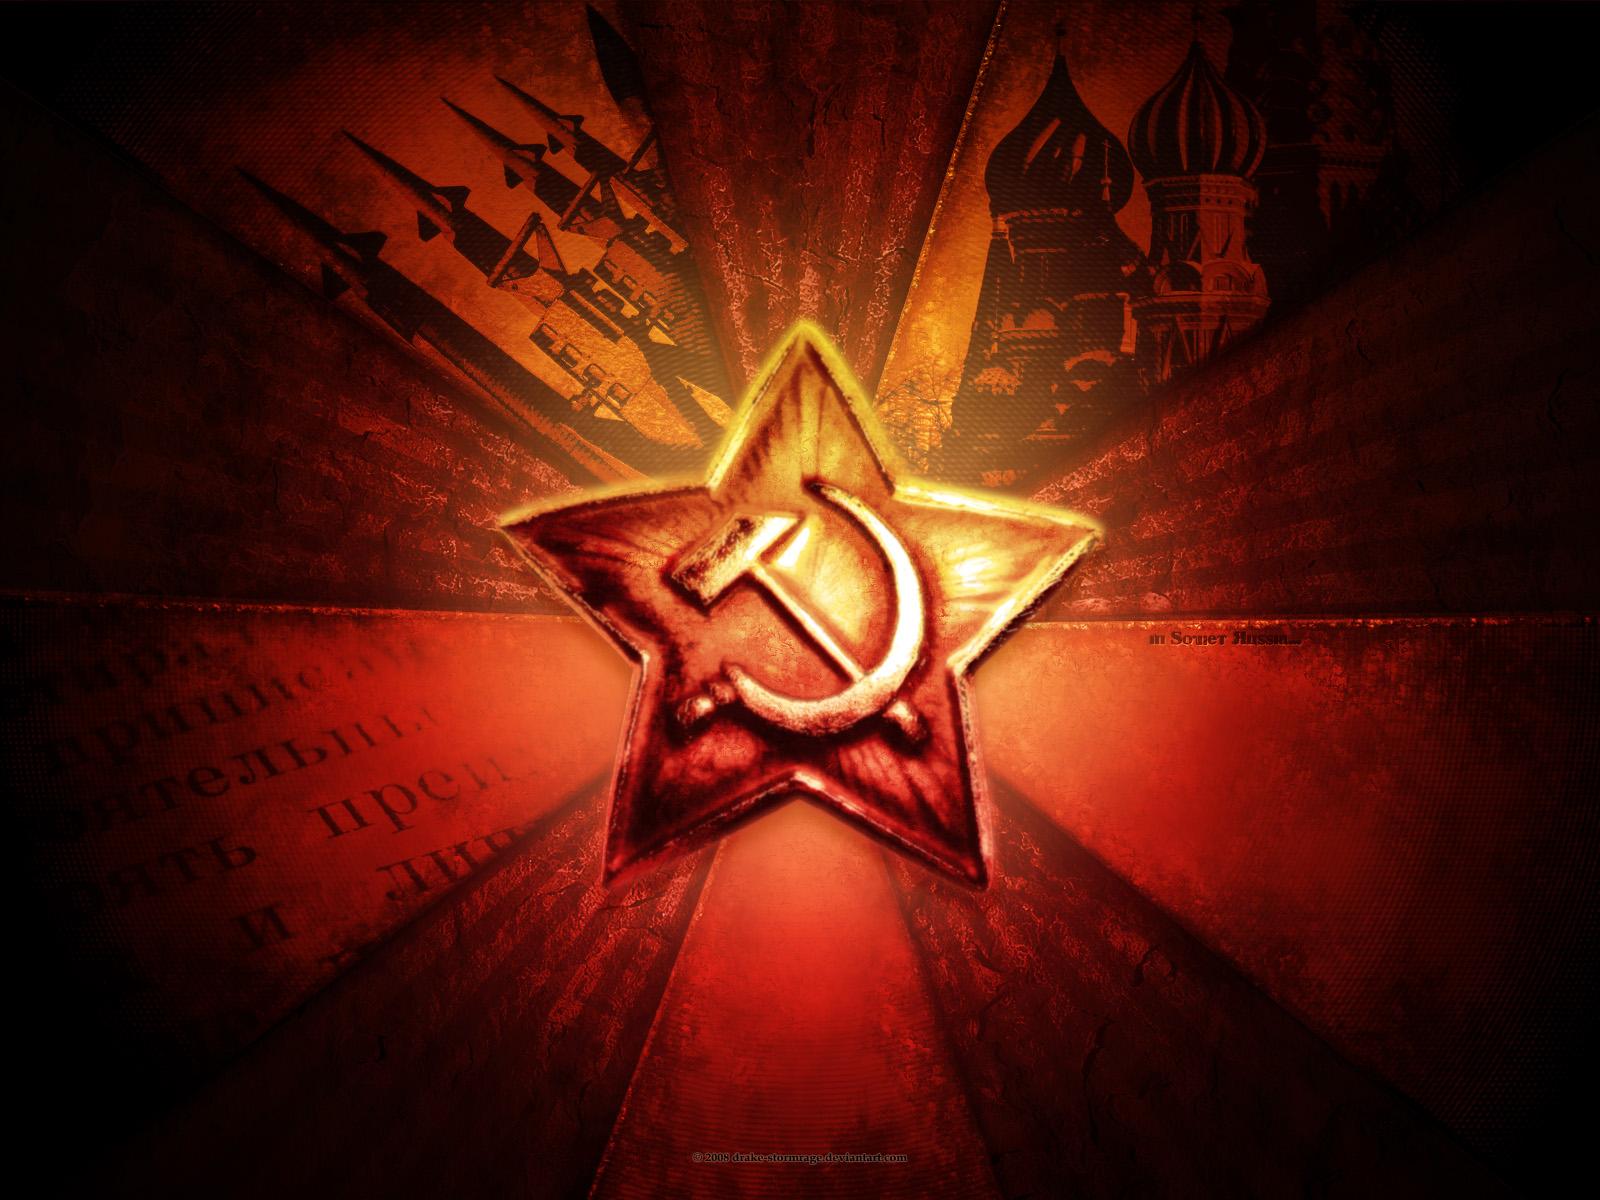 http://3.bp.blogspot.com/_2UbsSBz9ckE/S7FB7x0XrcI/AAAAAAAABJI/sJI4LvMyzvE/s1600/in_soviet_russia_HD.jpg